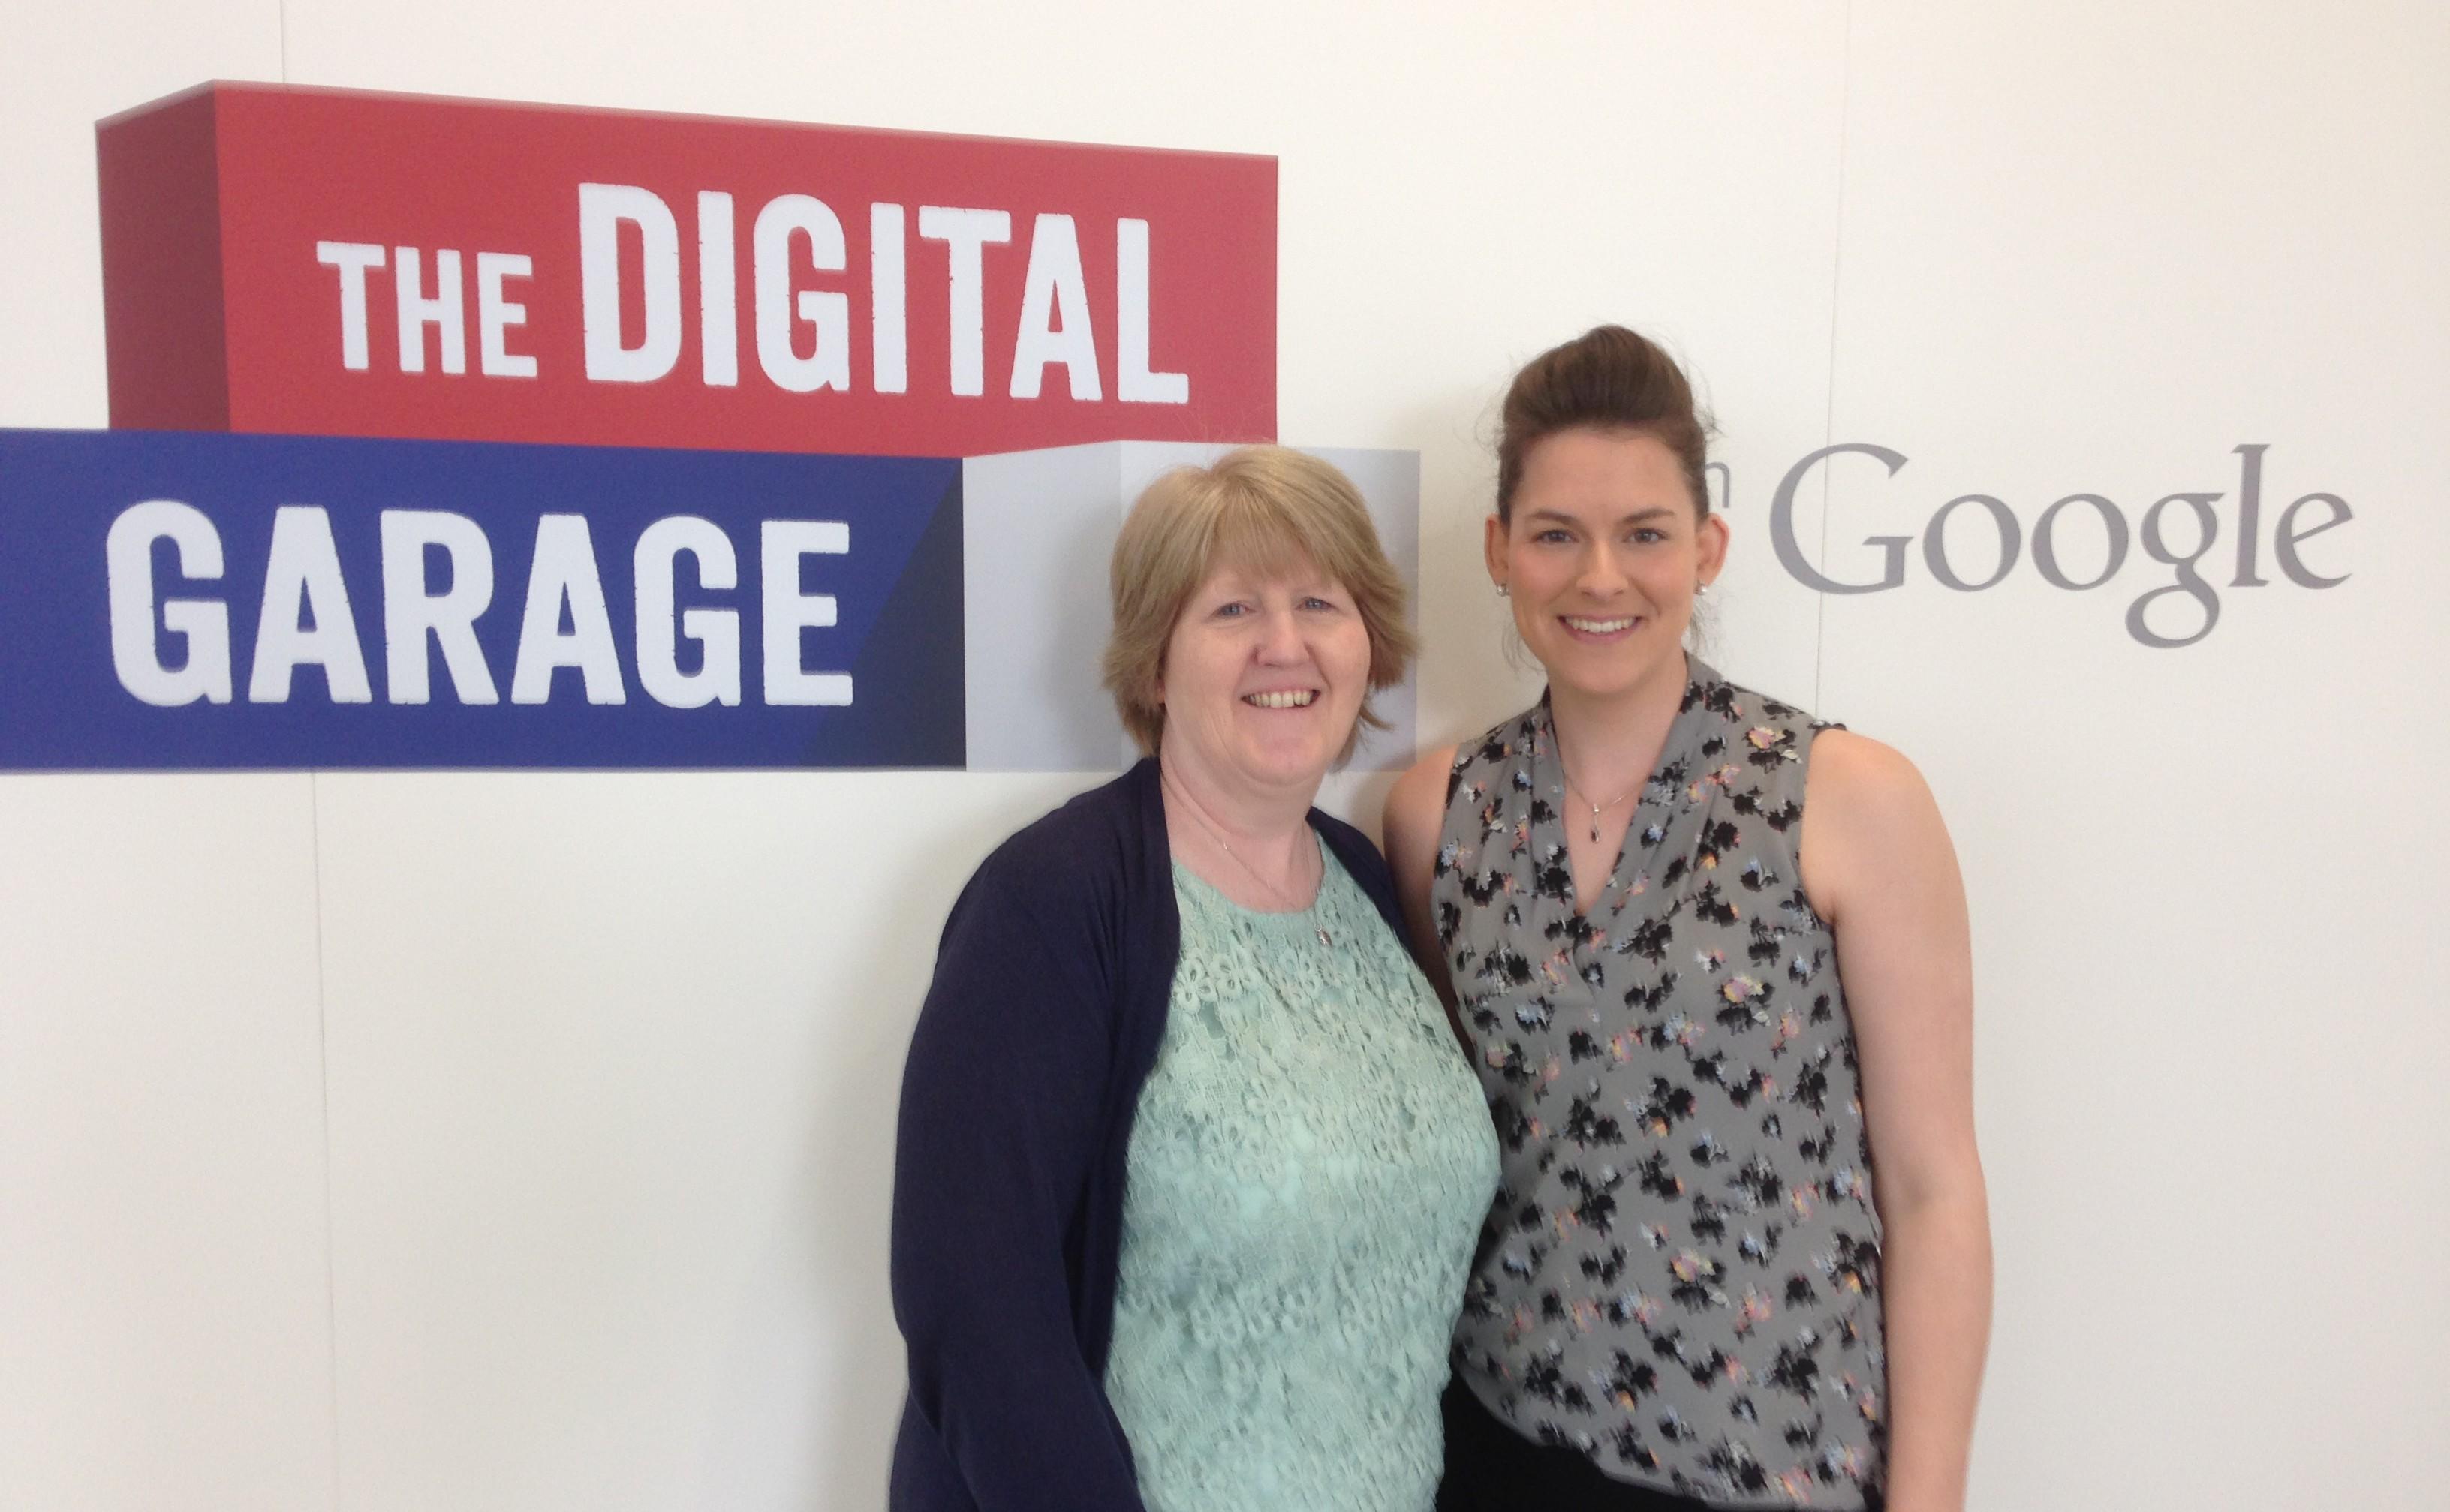 Google Digital Garage Leeds - Google Workshop - Social Progress Ltd